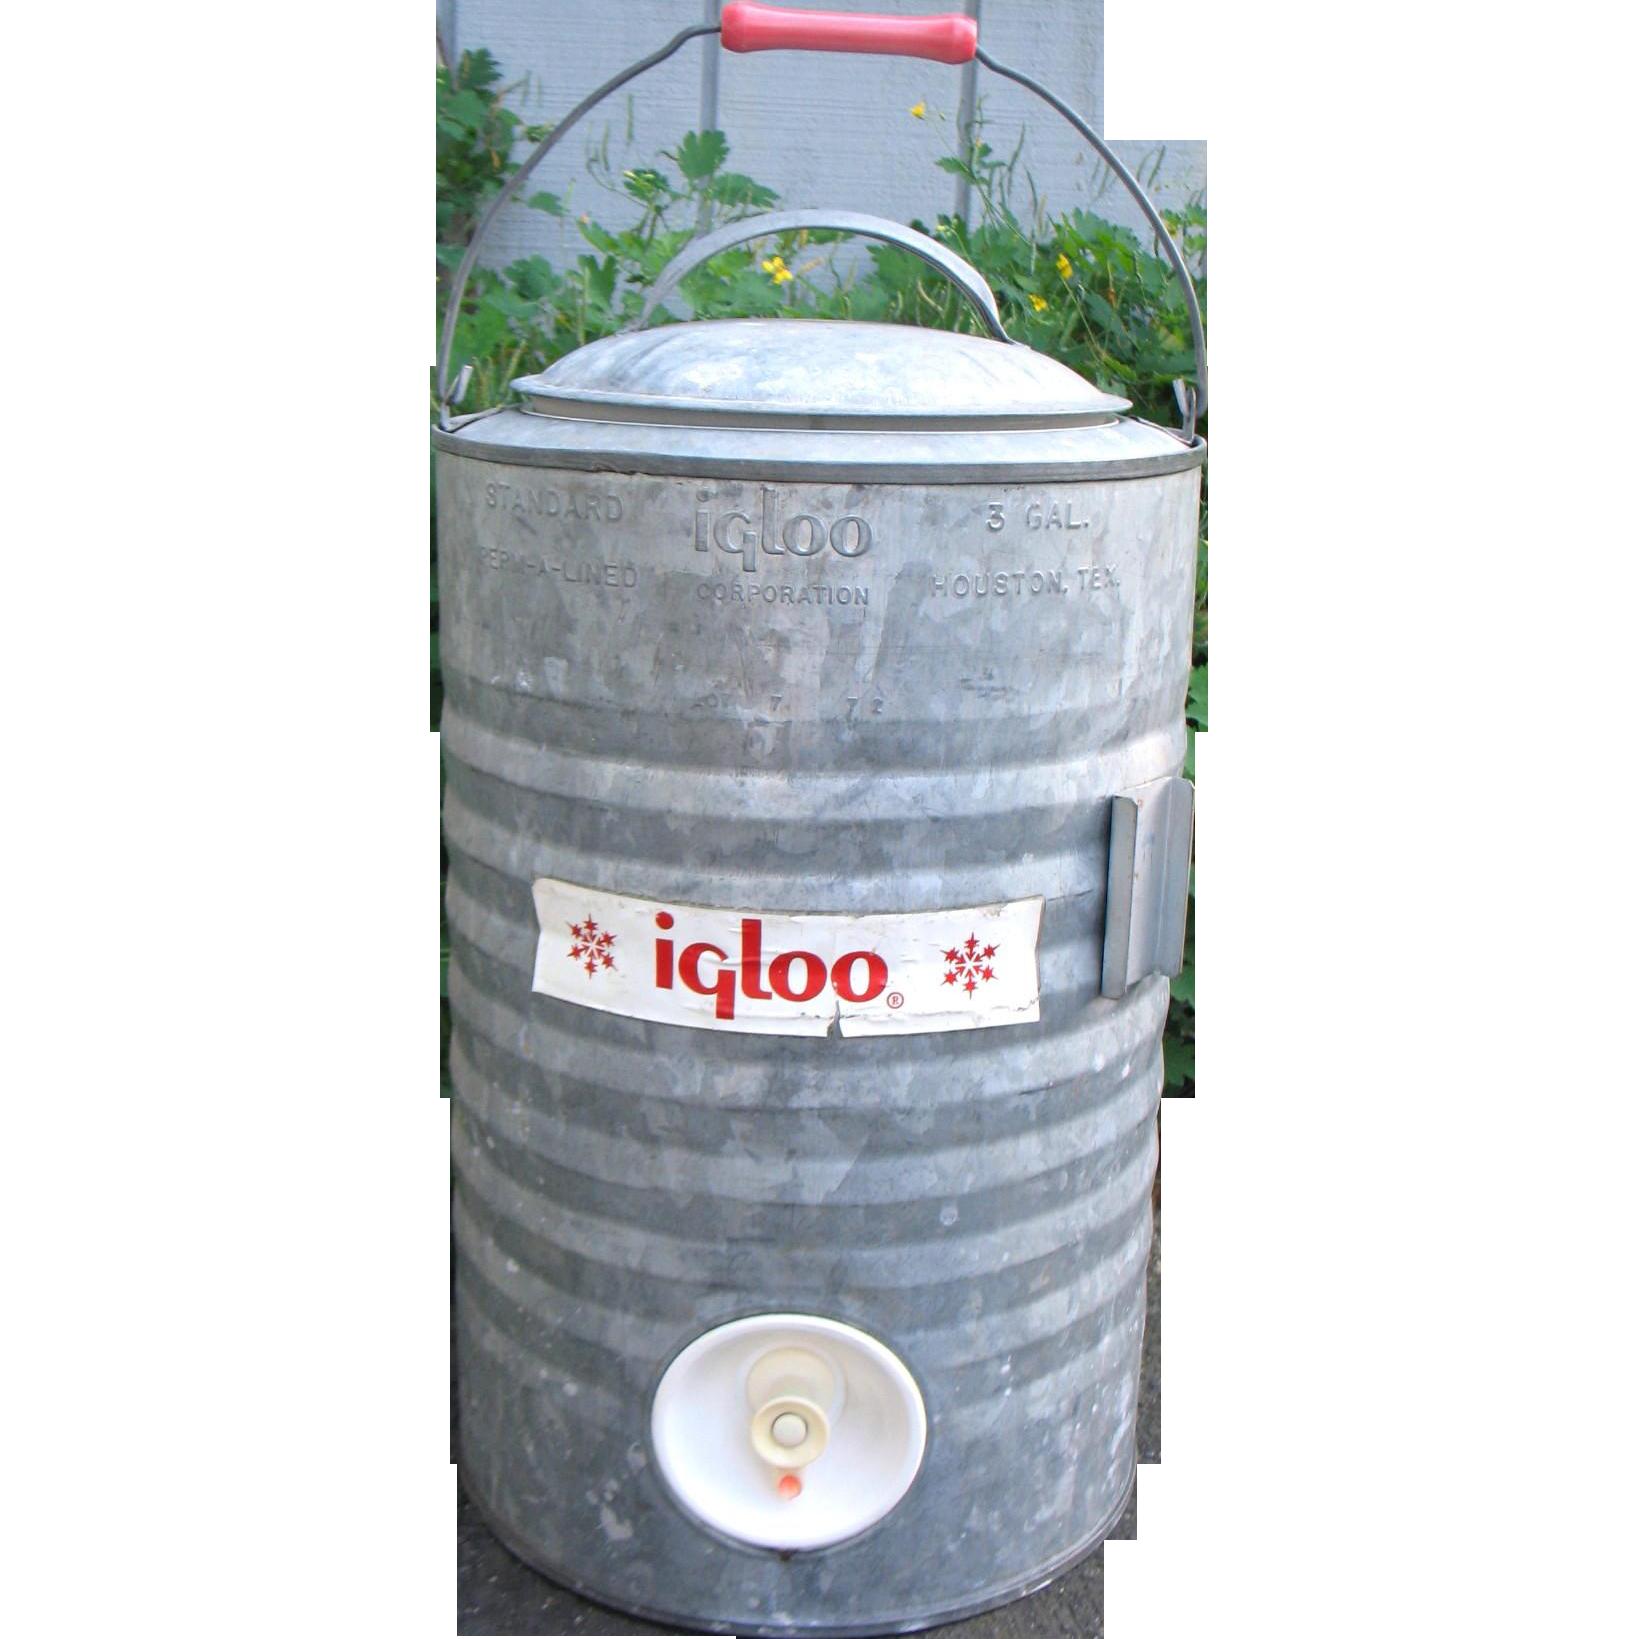 vintage igloo galvanized metal cooler 3 gallon spigot